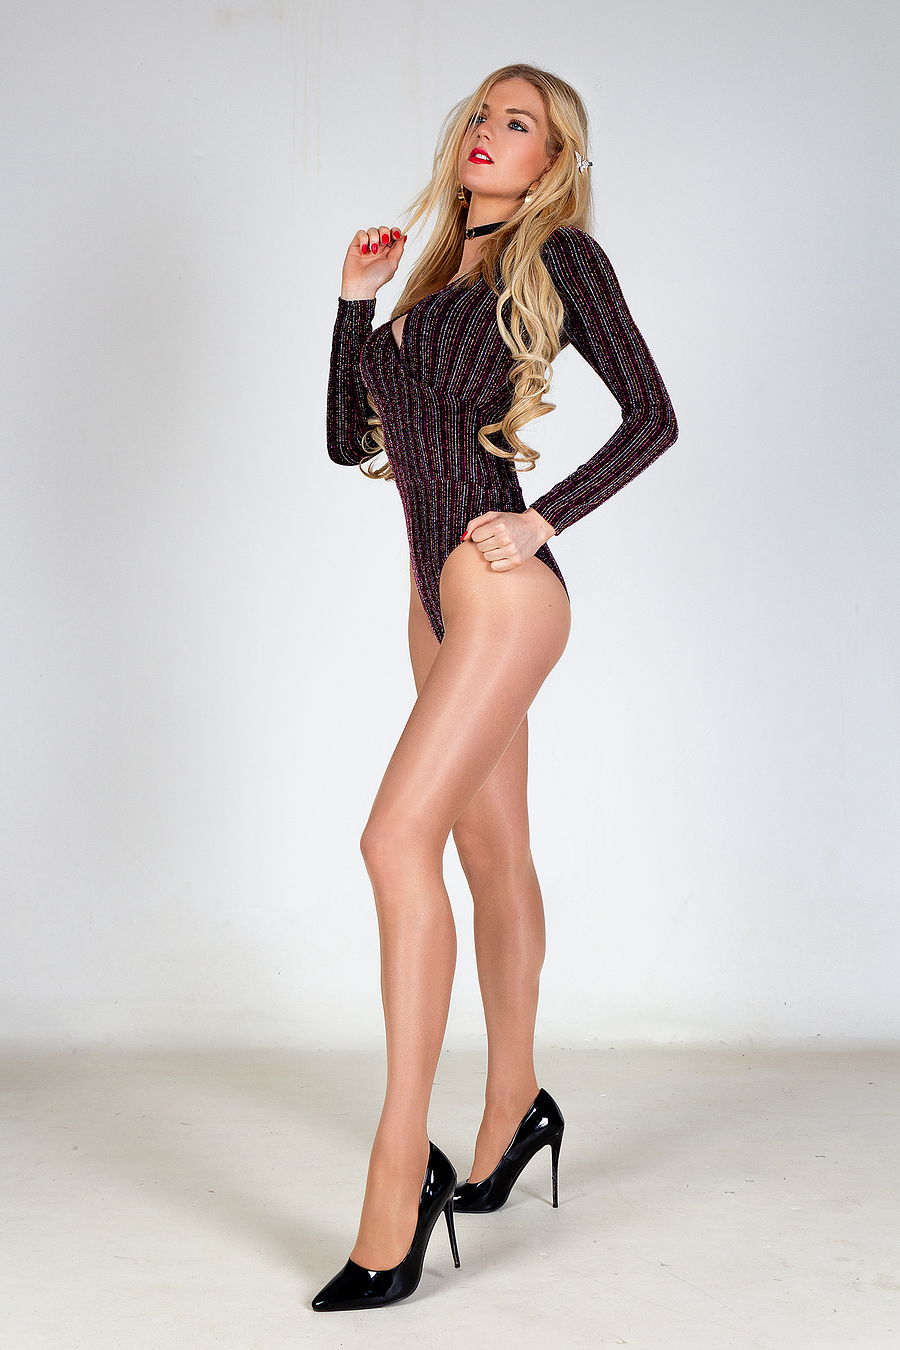 ♥ / Model Nadia Chloe Rose / Uploaded 15th December 2018 @ 06:37 PM